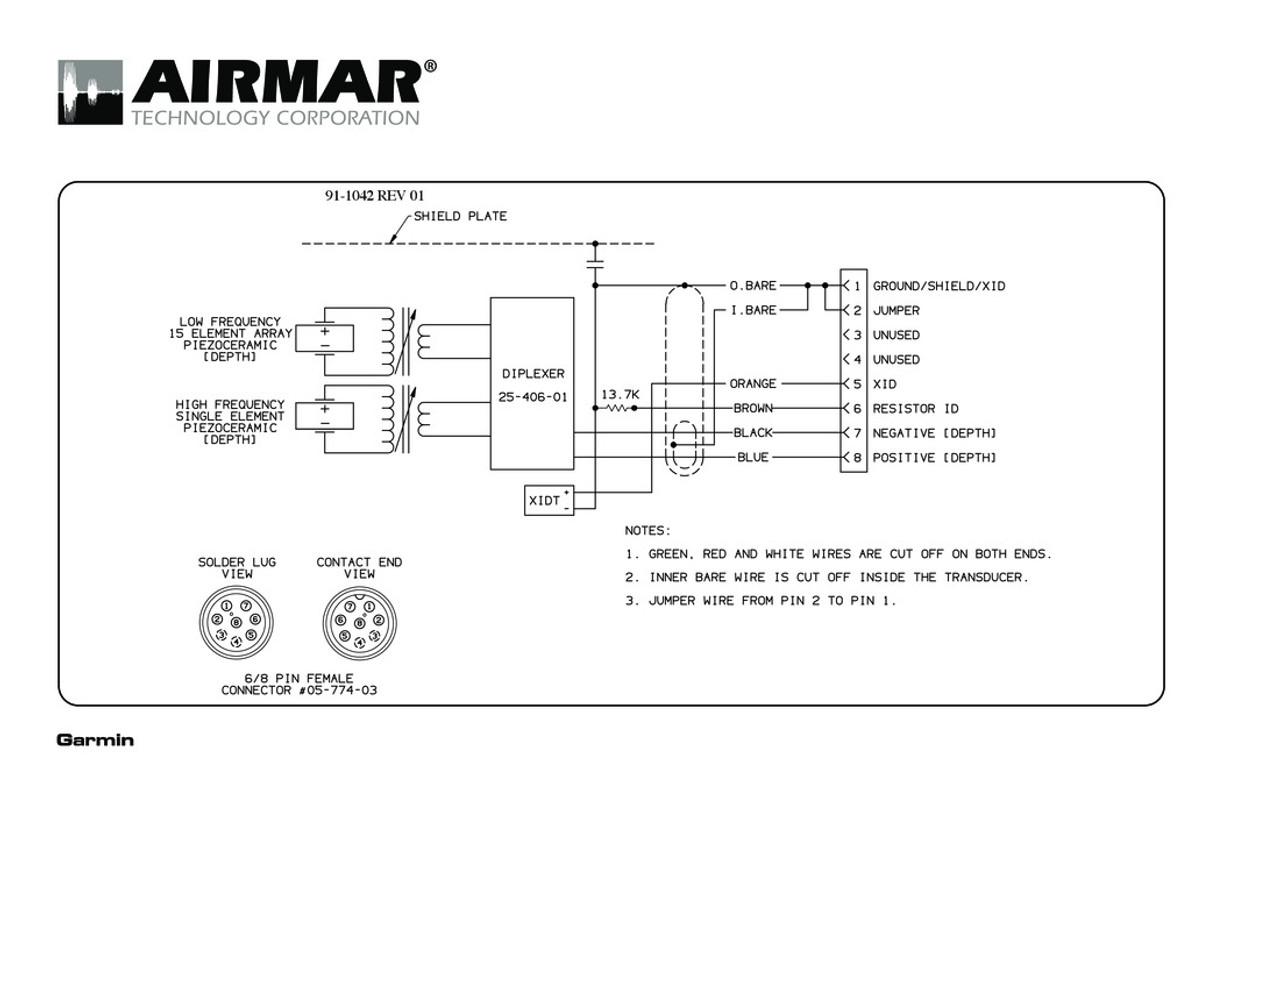 medium resolution of  garmin garmin marine wiring diagrams on garmin network cable wiring garmin 3010c wiring garmin speedometer